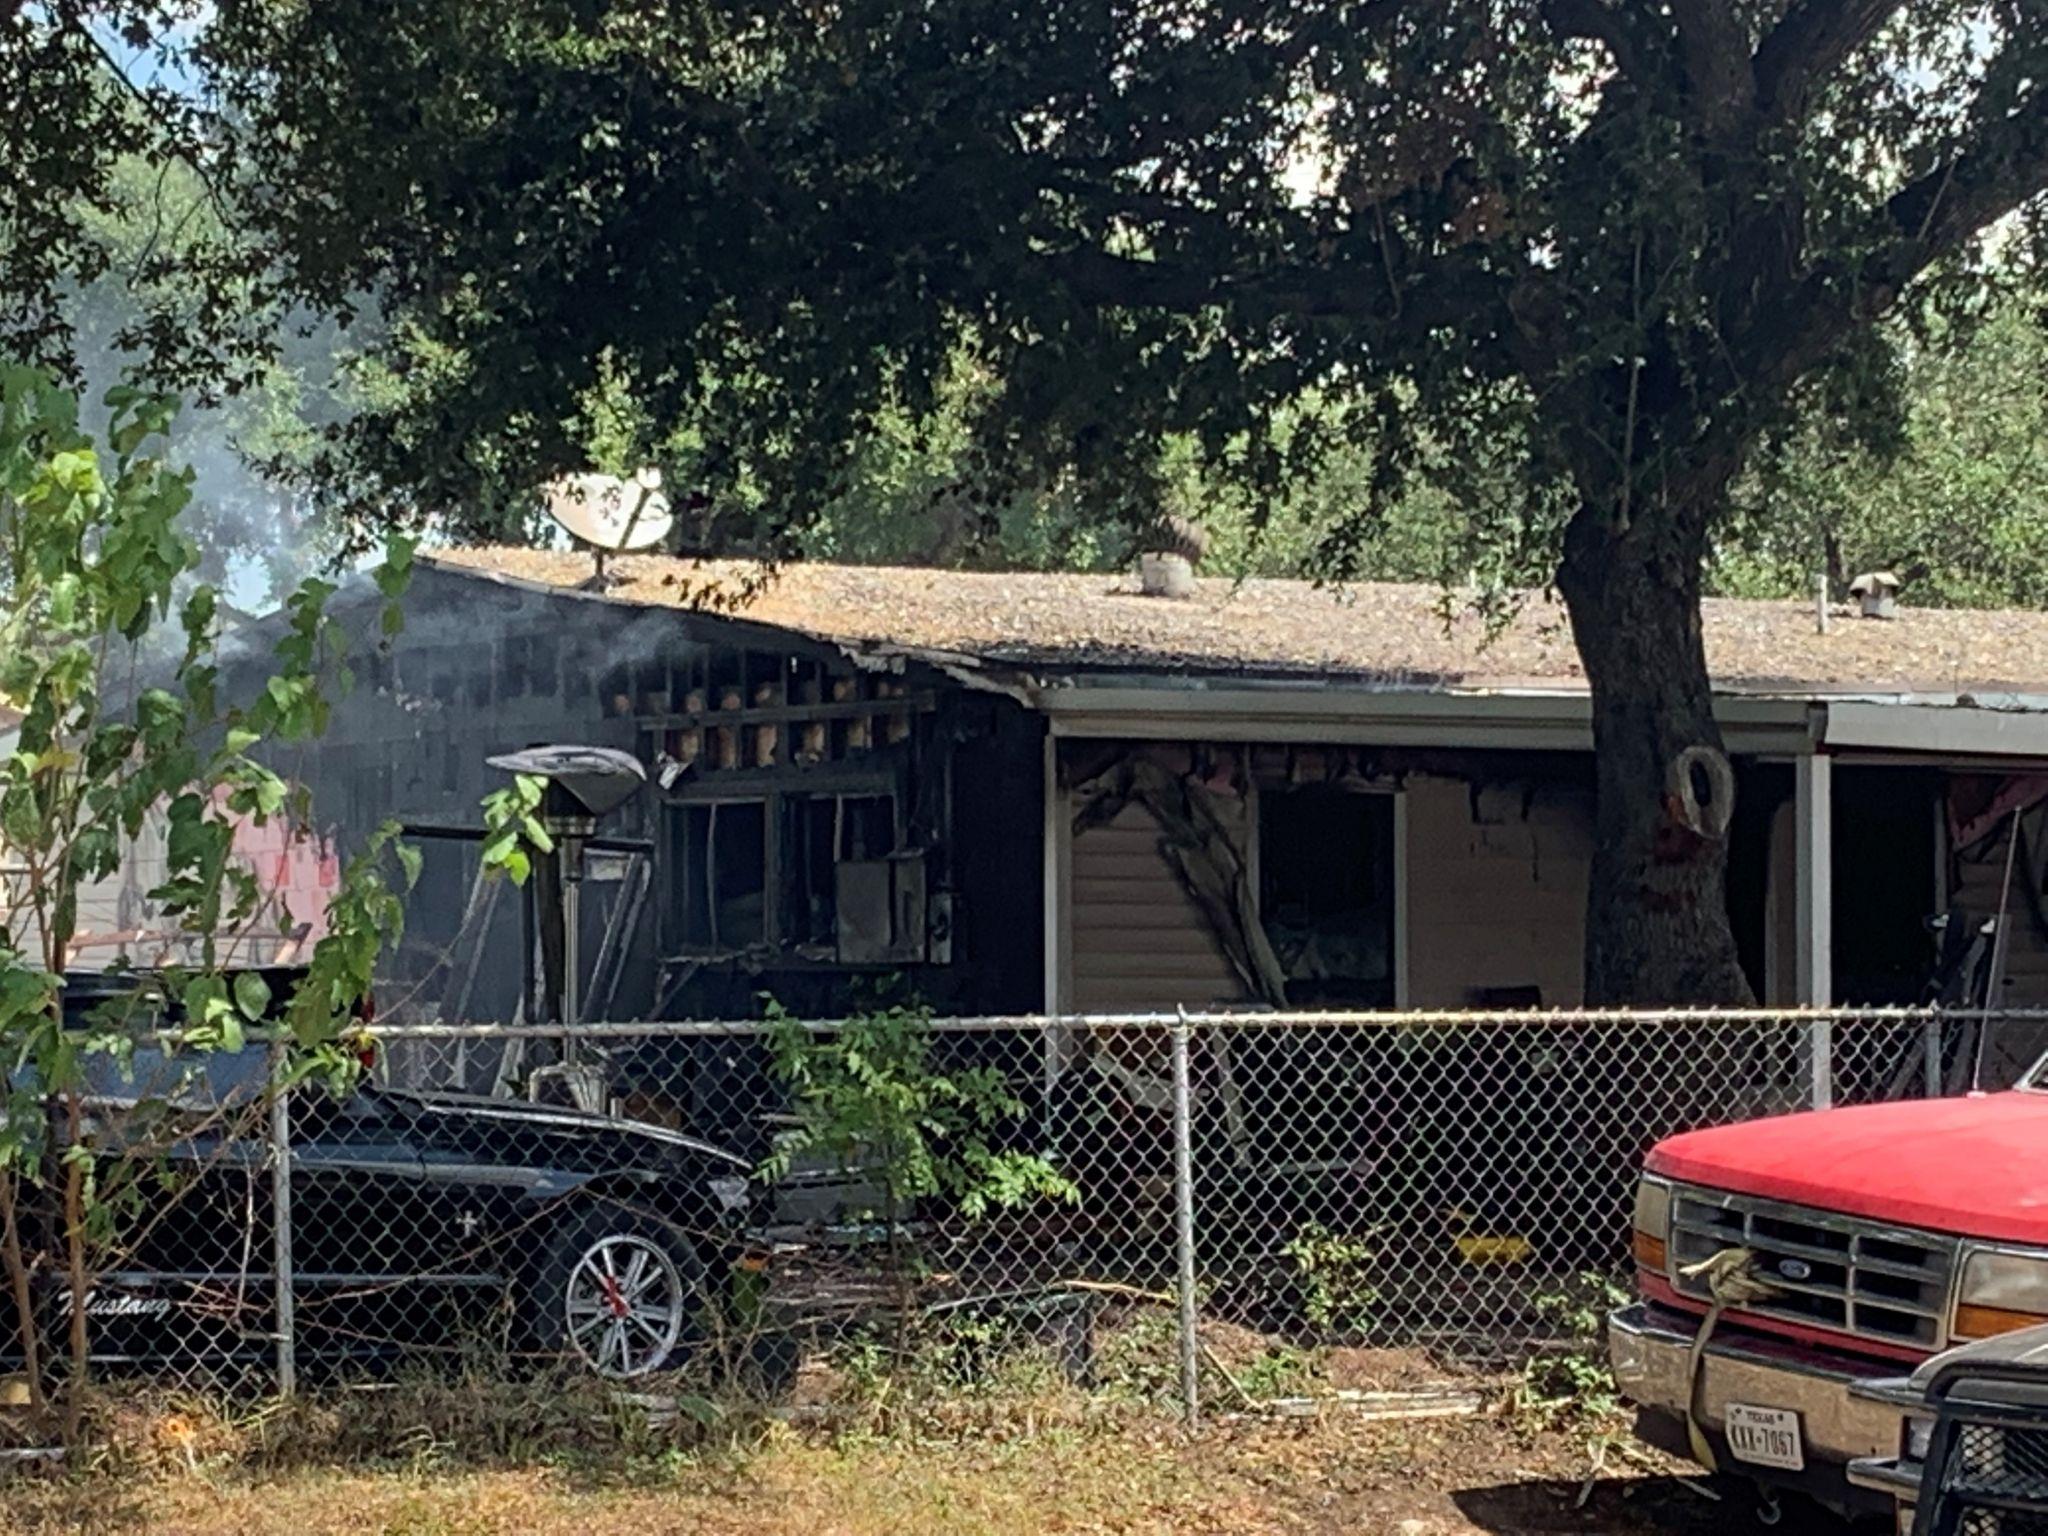 Investigators: Arson a possibility in South Side house fire